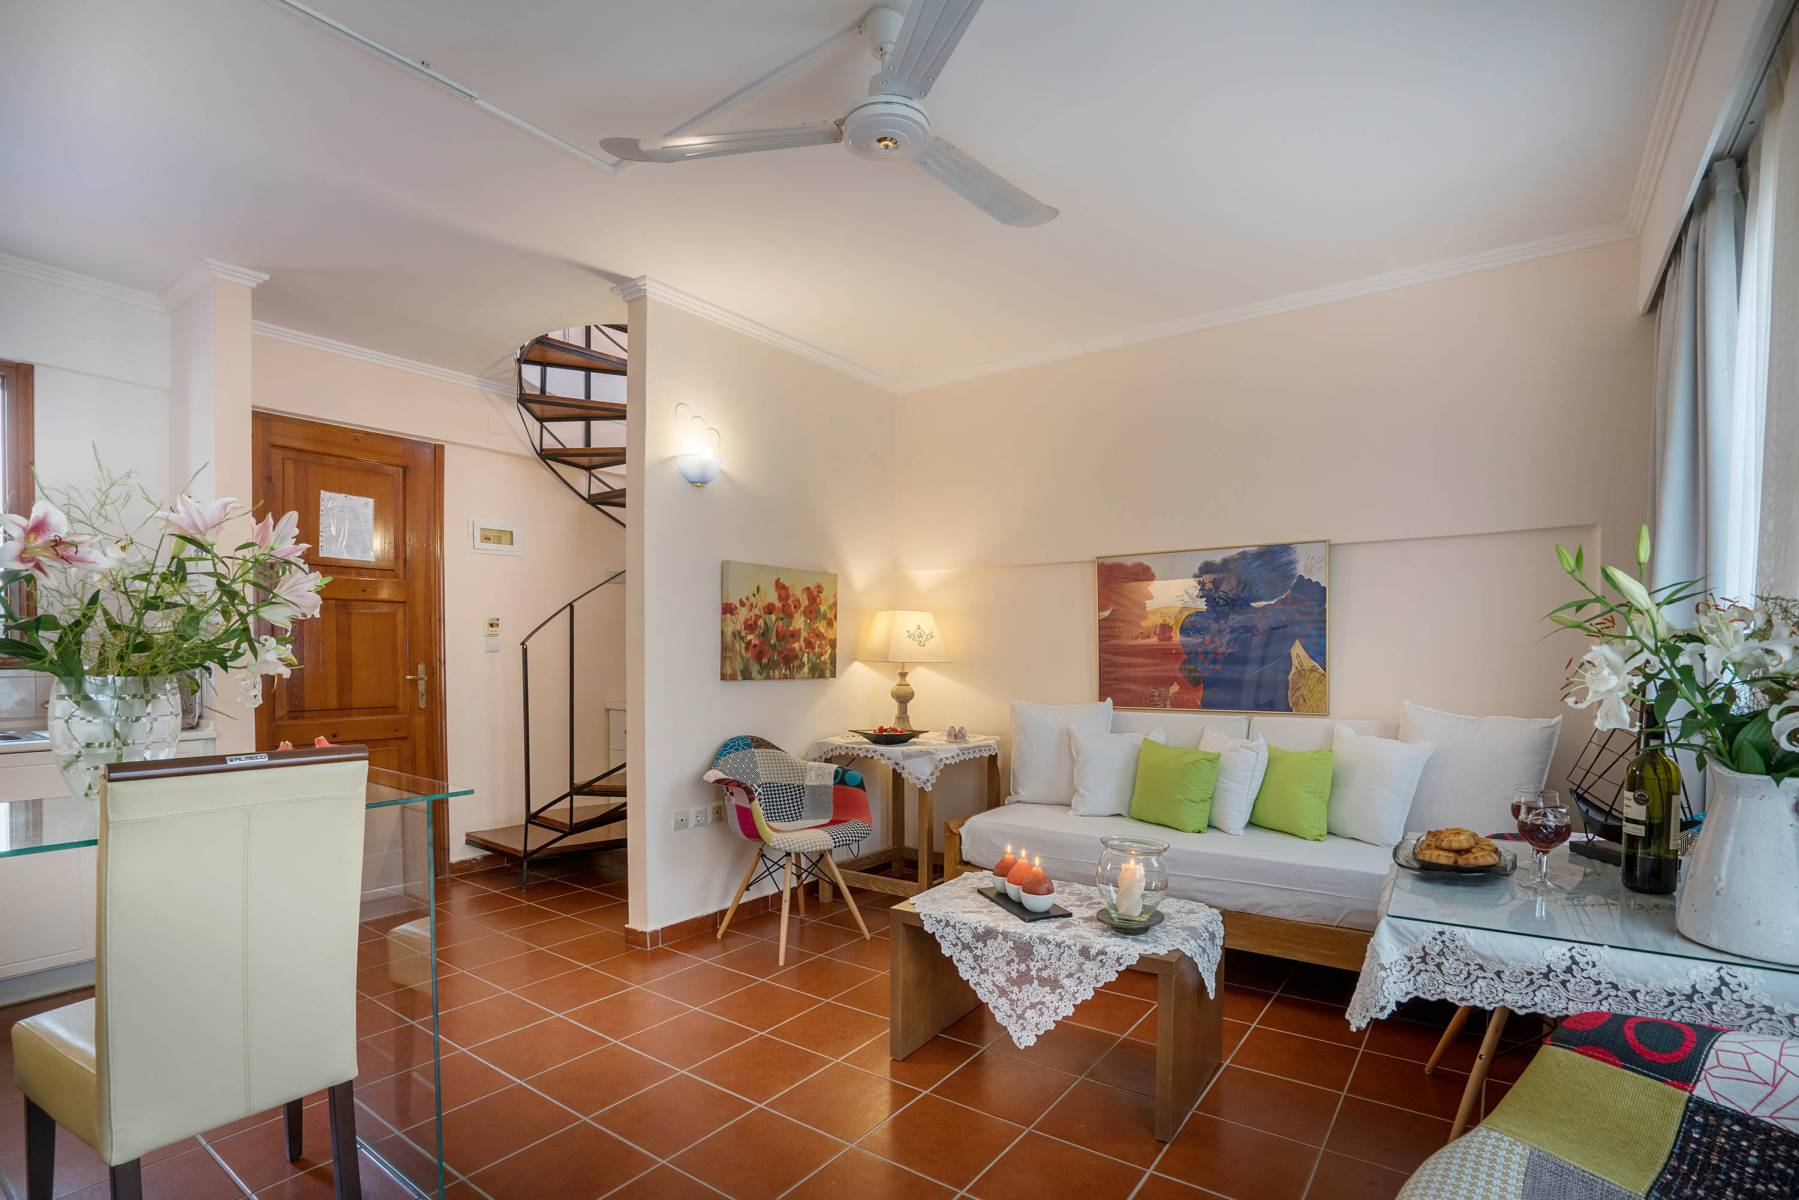 Village Apartment Hotel Rethymno